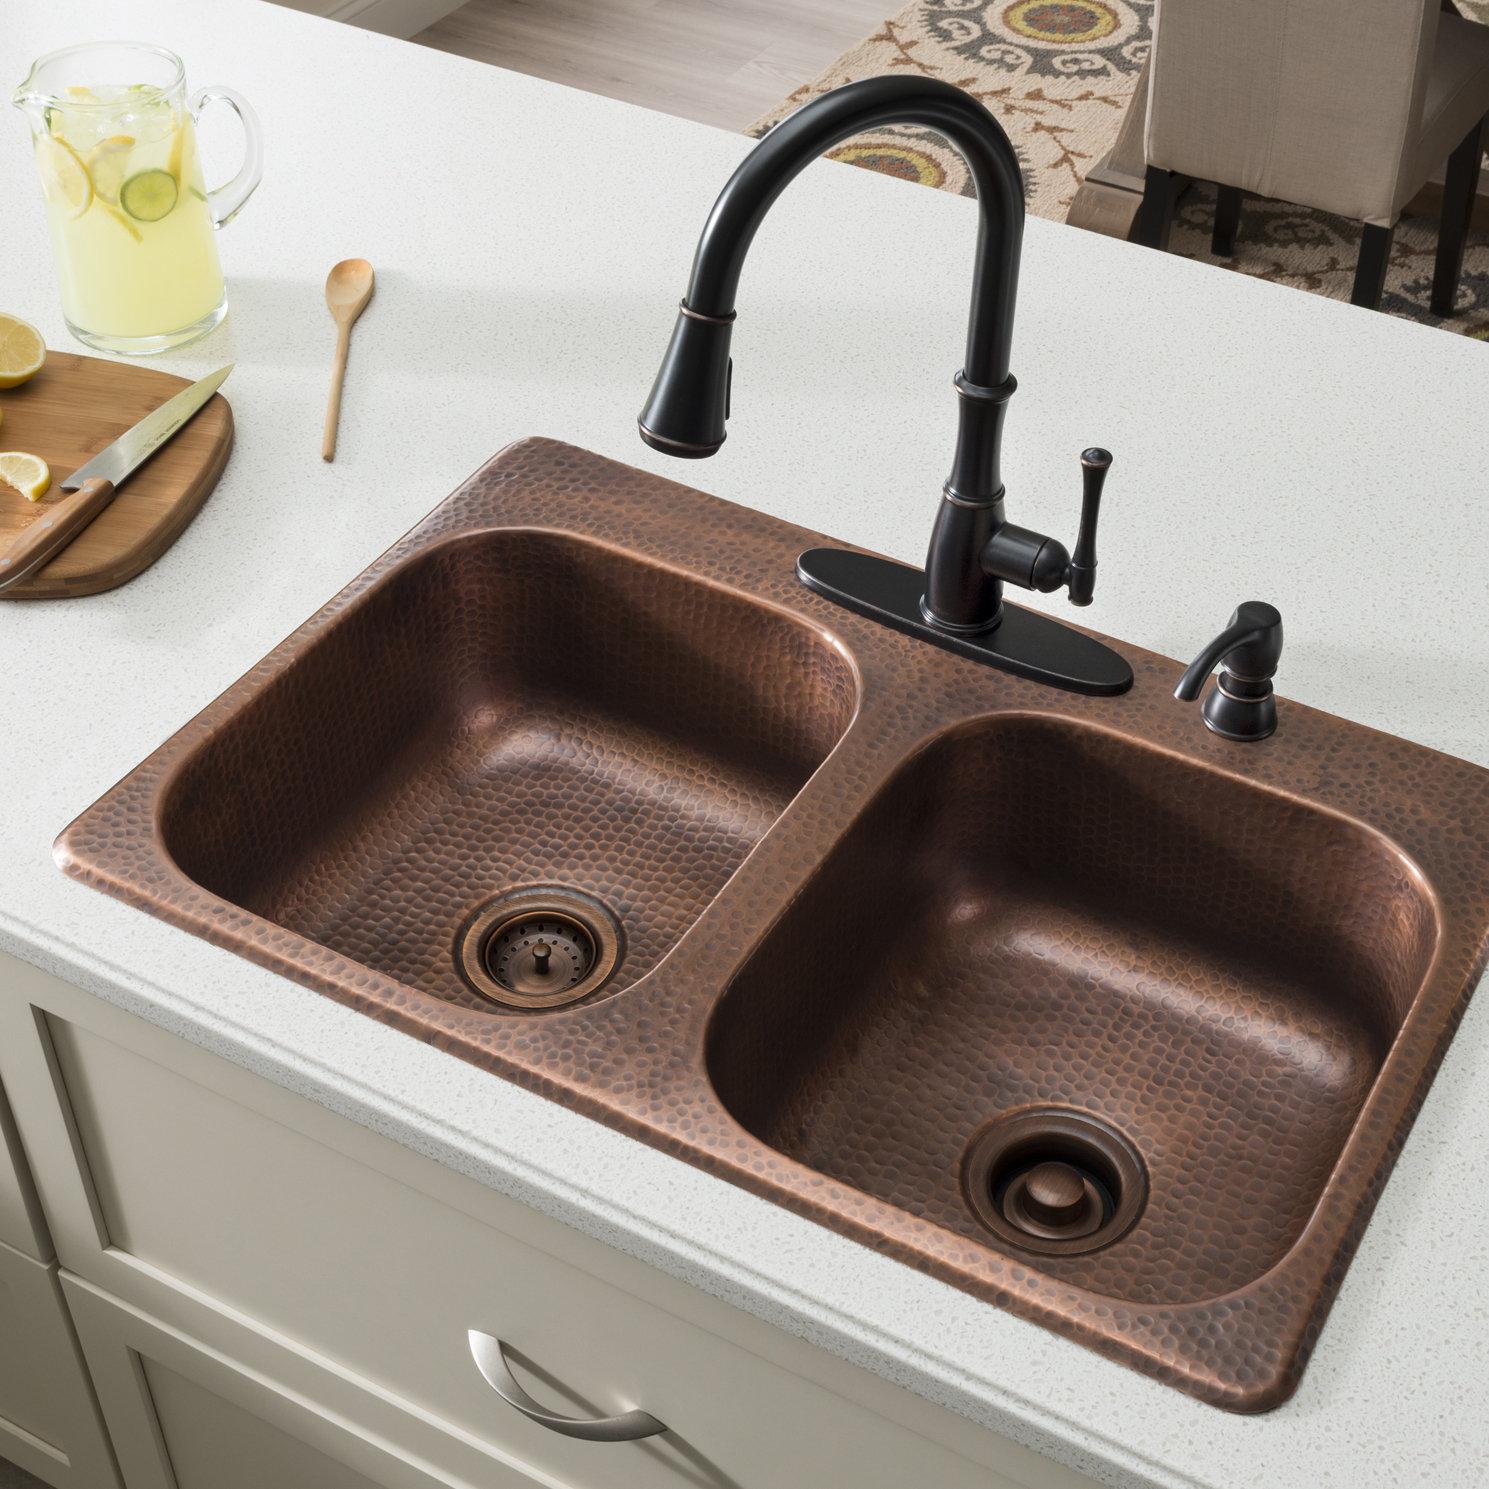 Sinkology Raphael 33 L X 22 W Double Bowl Drop In Kitchen Sink Reviews Wayfair